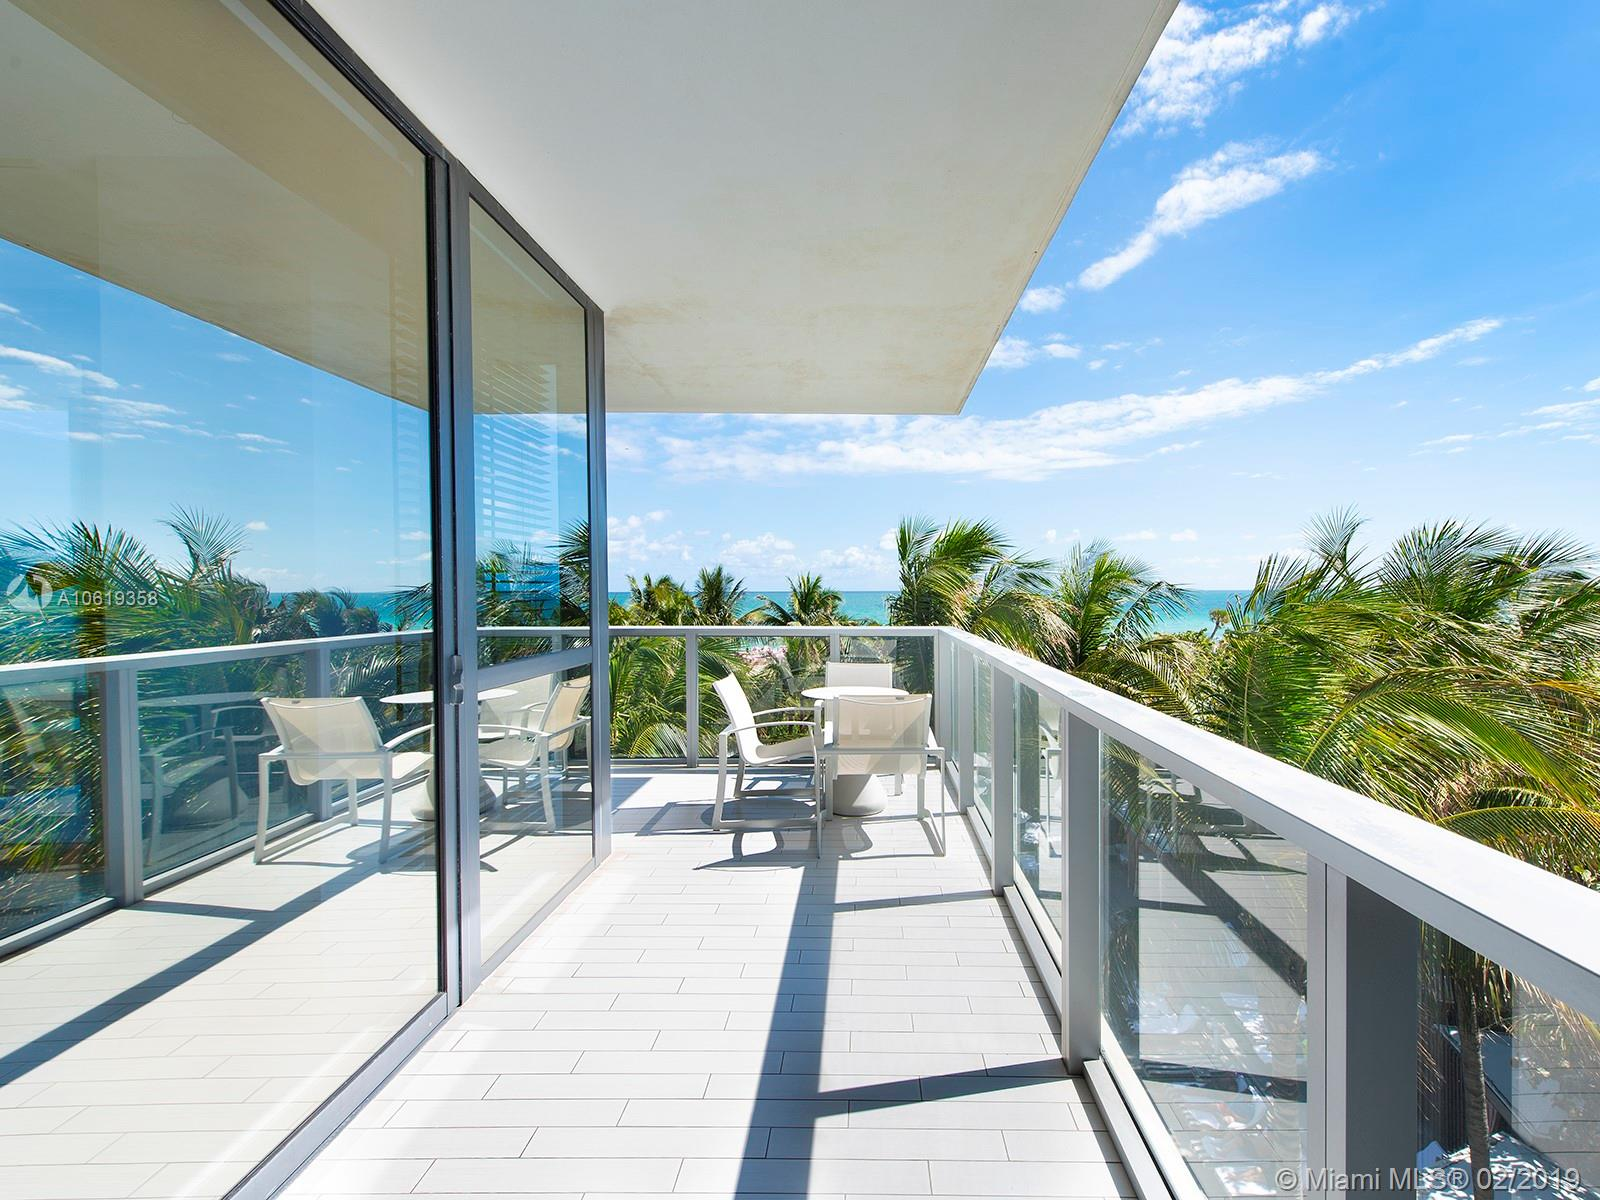 Photo of W South Beach Residences Apt 428